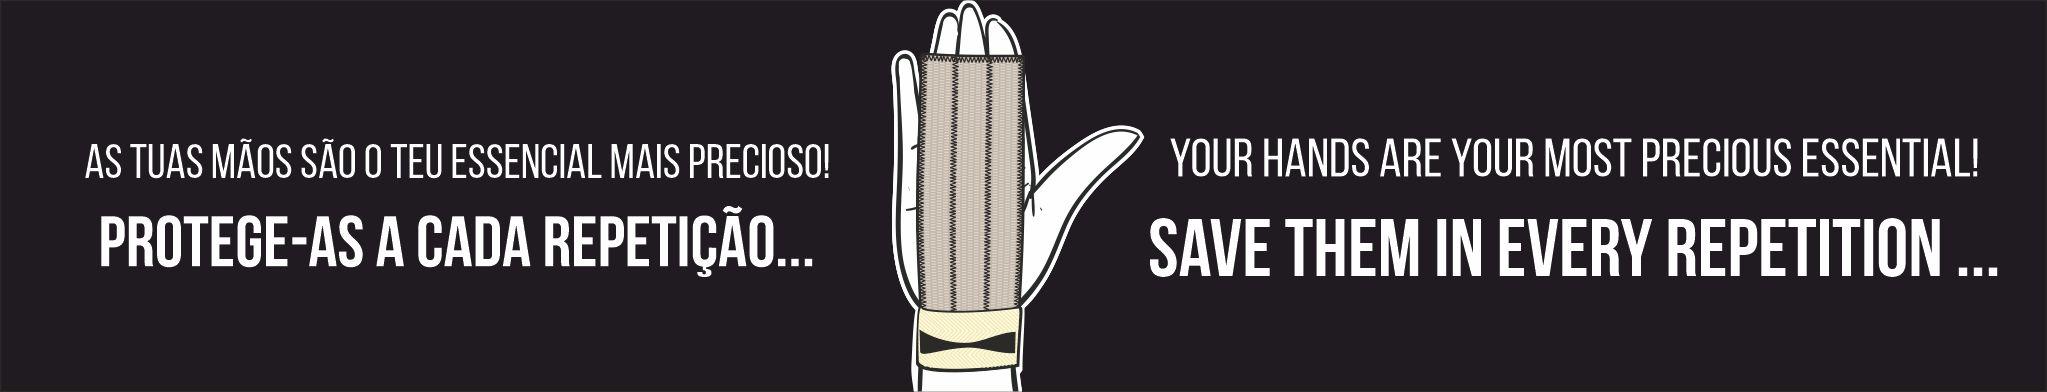 grabber-grip-banner-hands